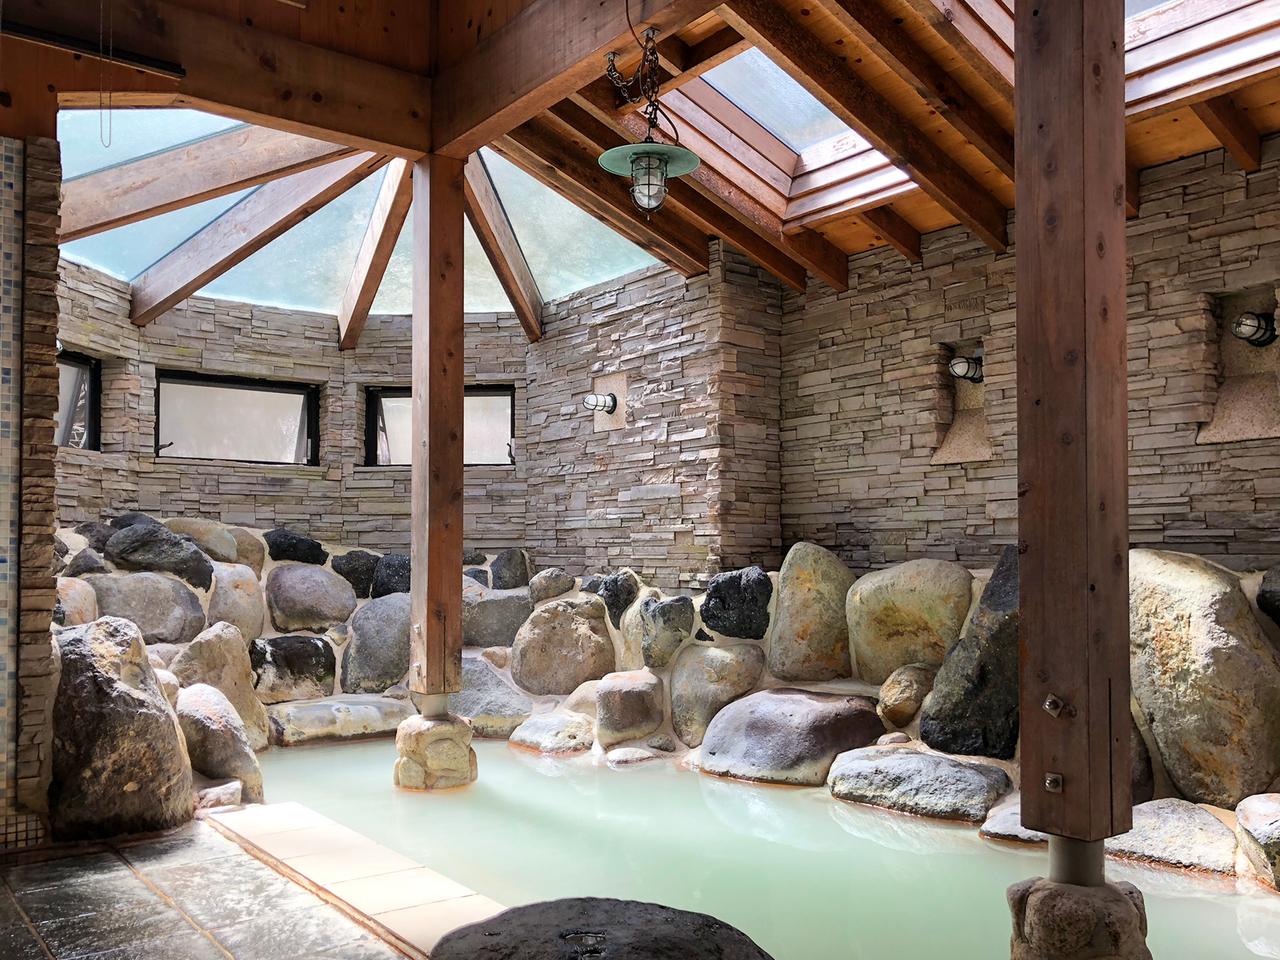 箱根太陽山荘の岩風呂